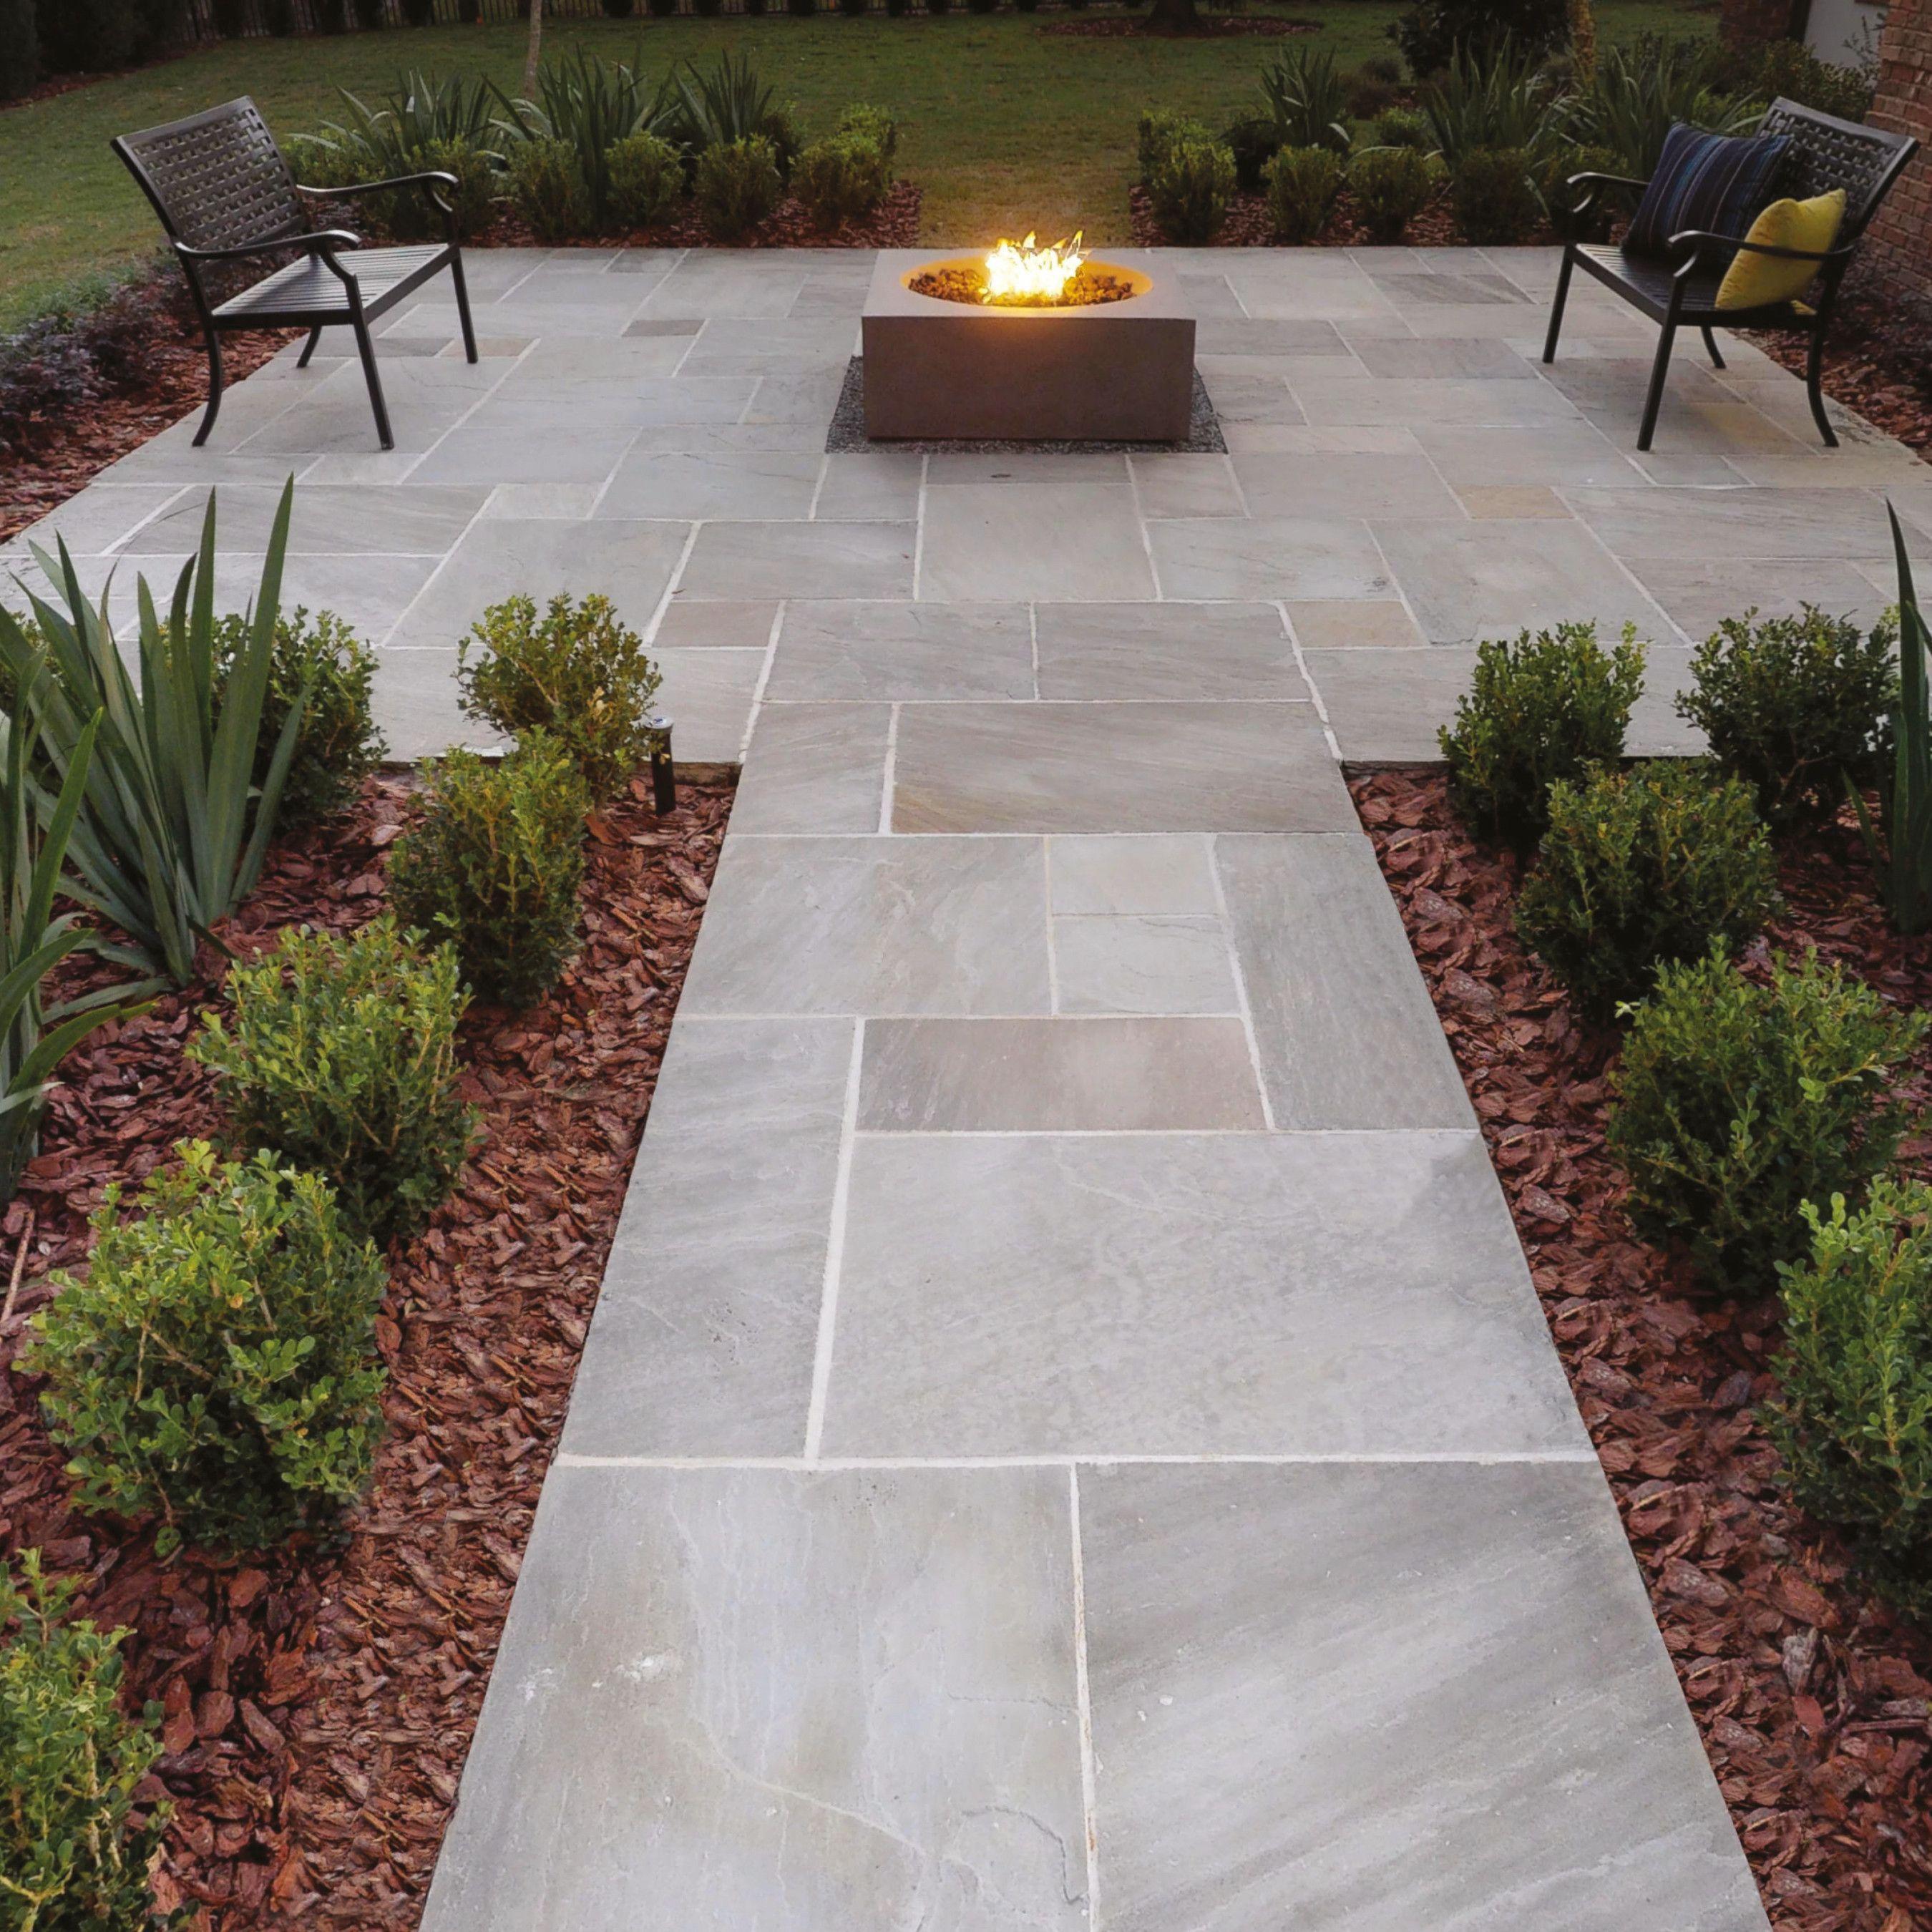 Natural Paving Classicstone Kandla Promenade Paving Slabs Garden Paving Outdoor Gardens Design Stone Landscaping